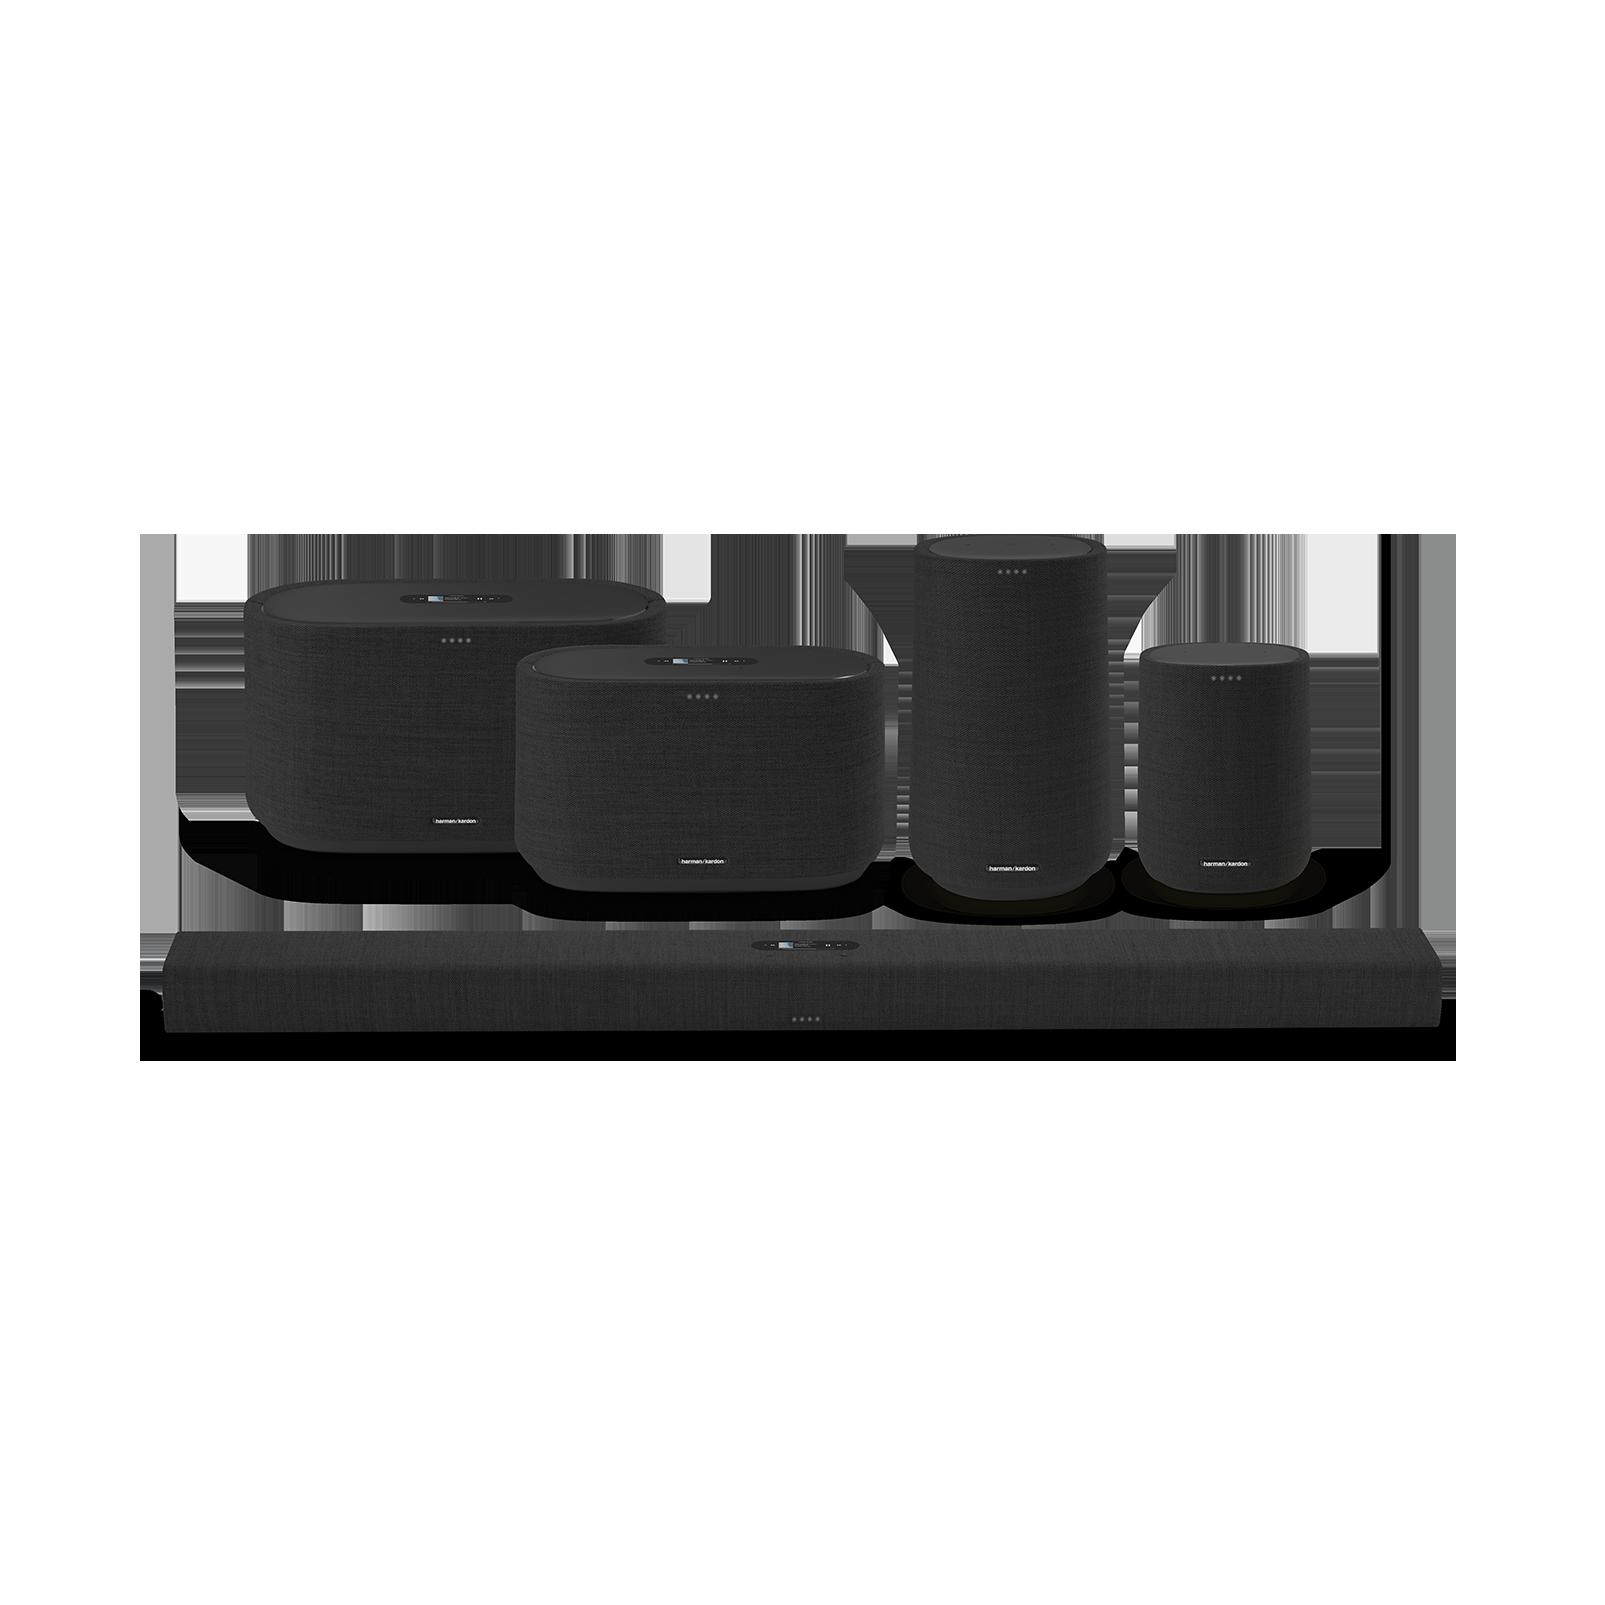 Harman Kardon Citation Bar - Black - The smartest soundbar for movies and music - Detailshot 5